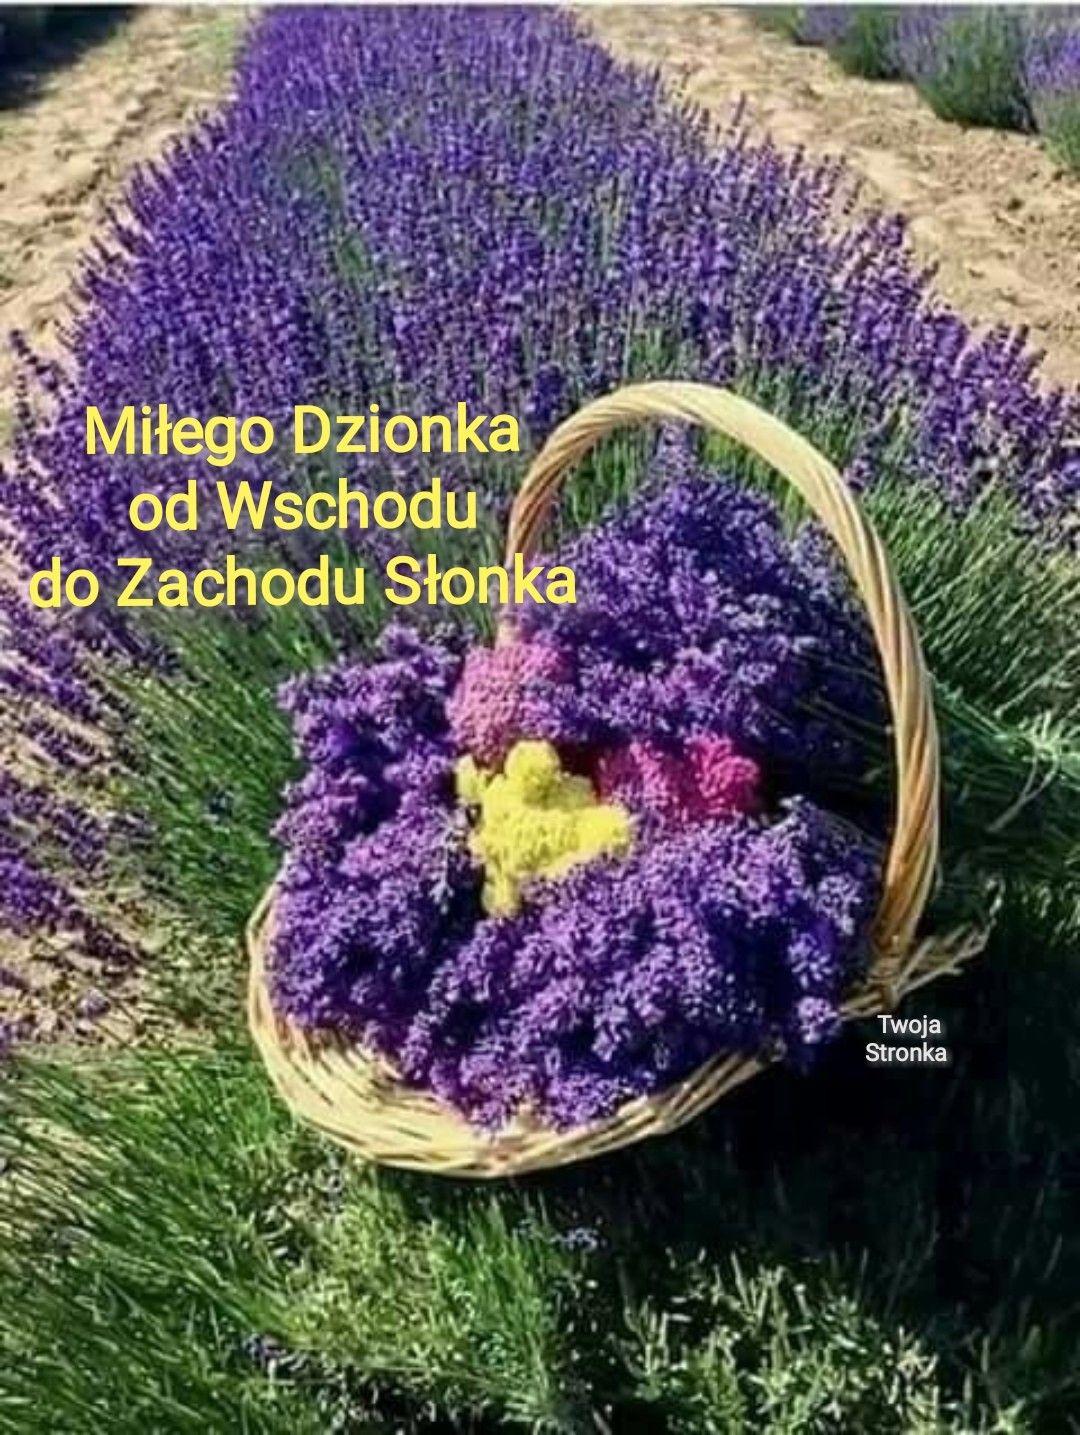 Pin By Halina Grycza On Dzien Dobry Purple Flowers Lavender Flowers Lavender Plant